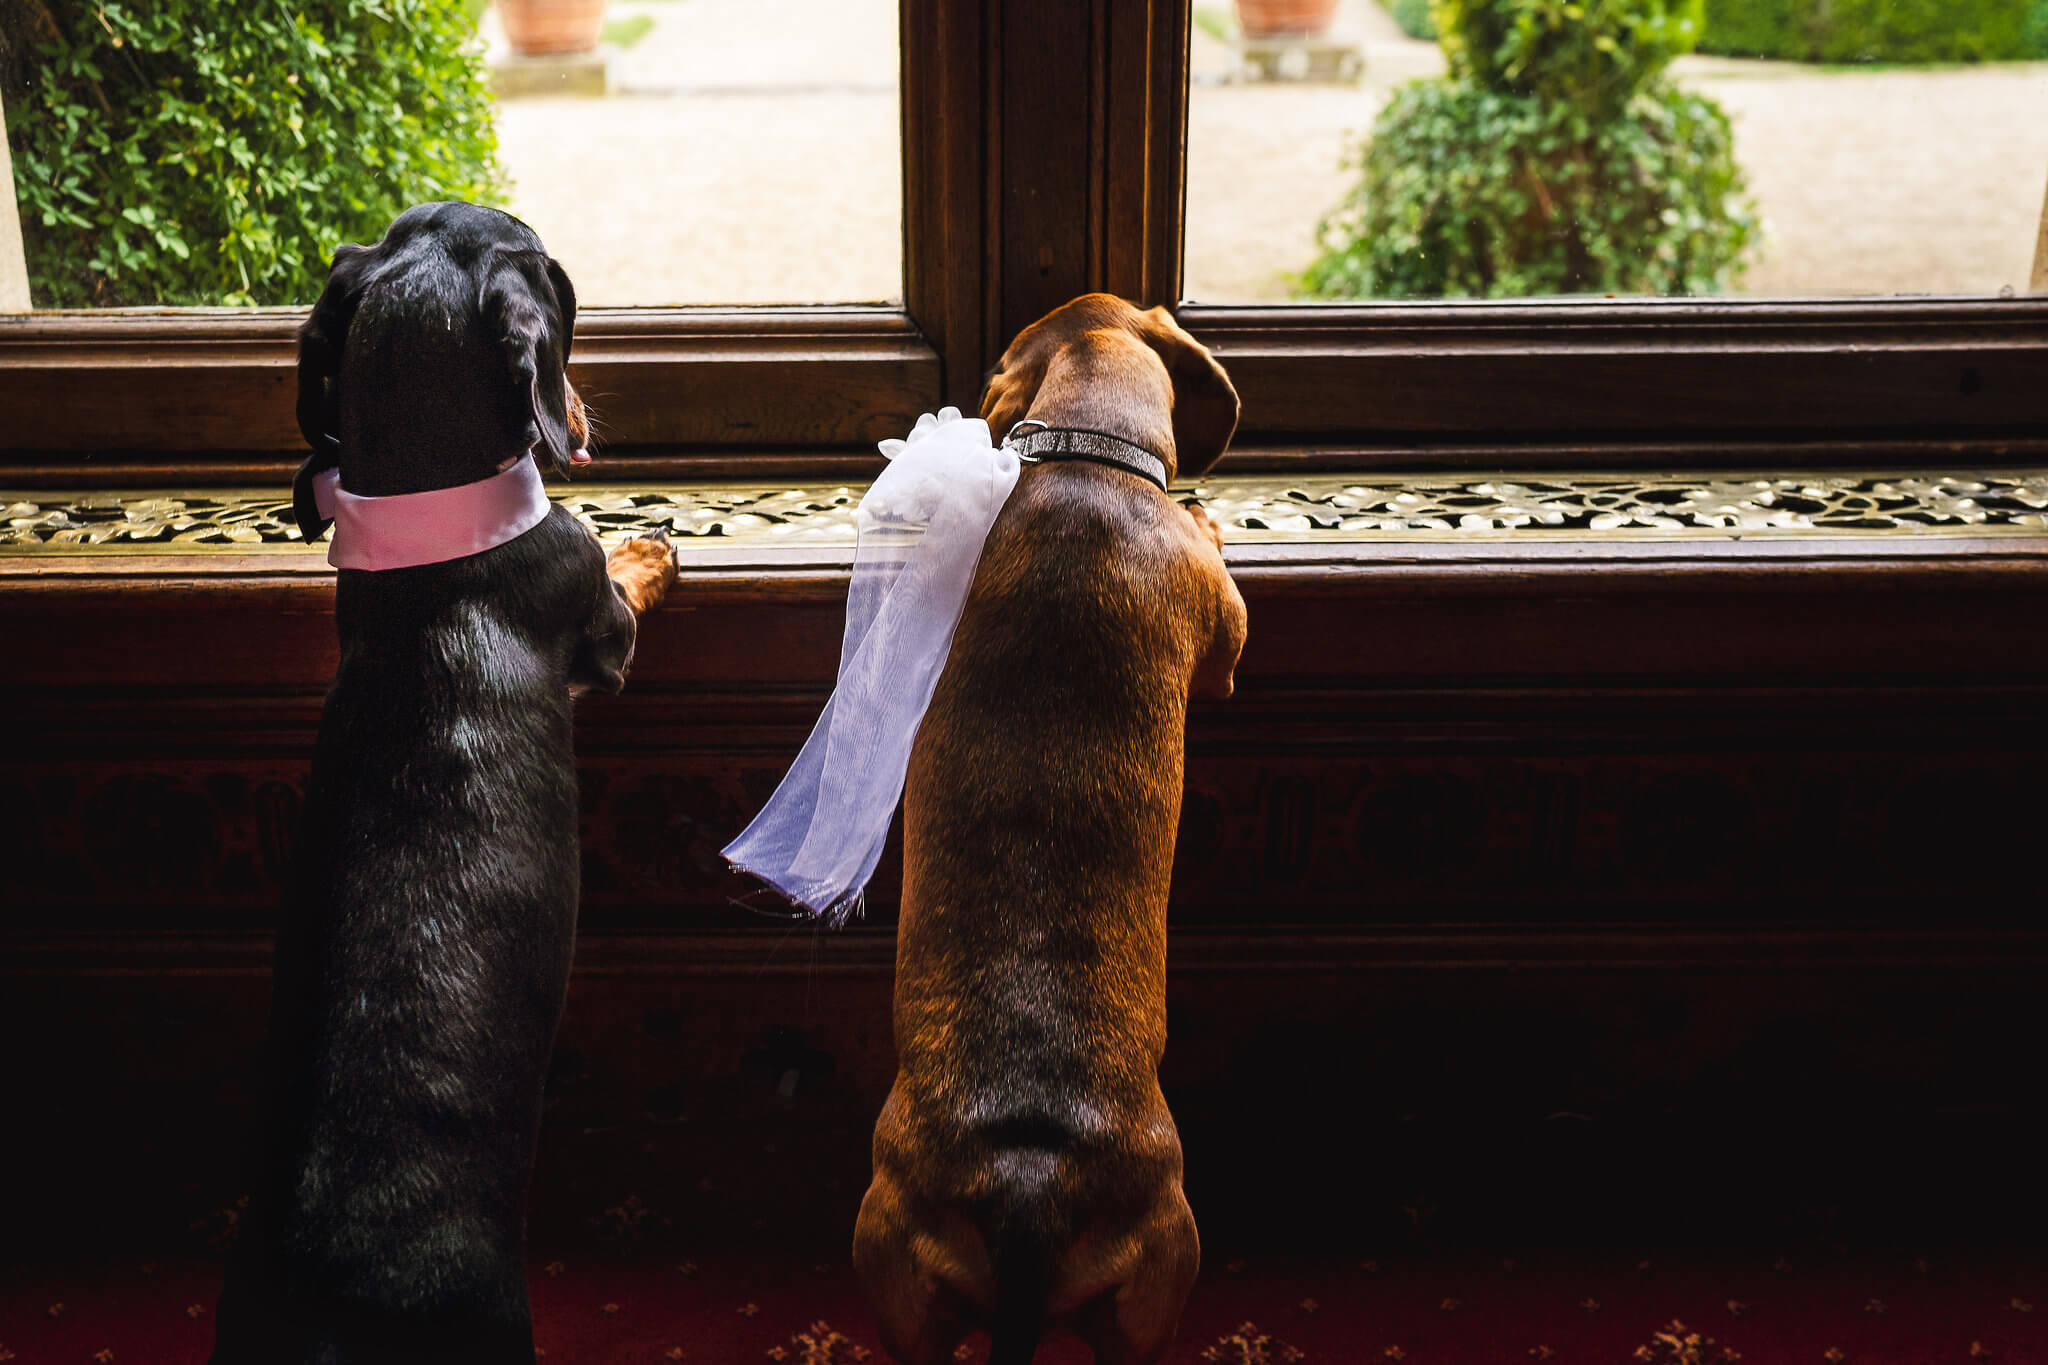 Dogs in a pet friendly venue